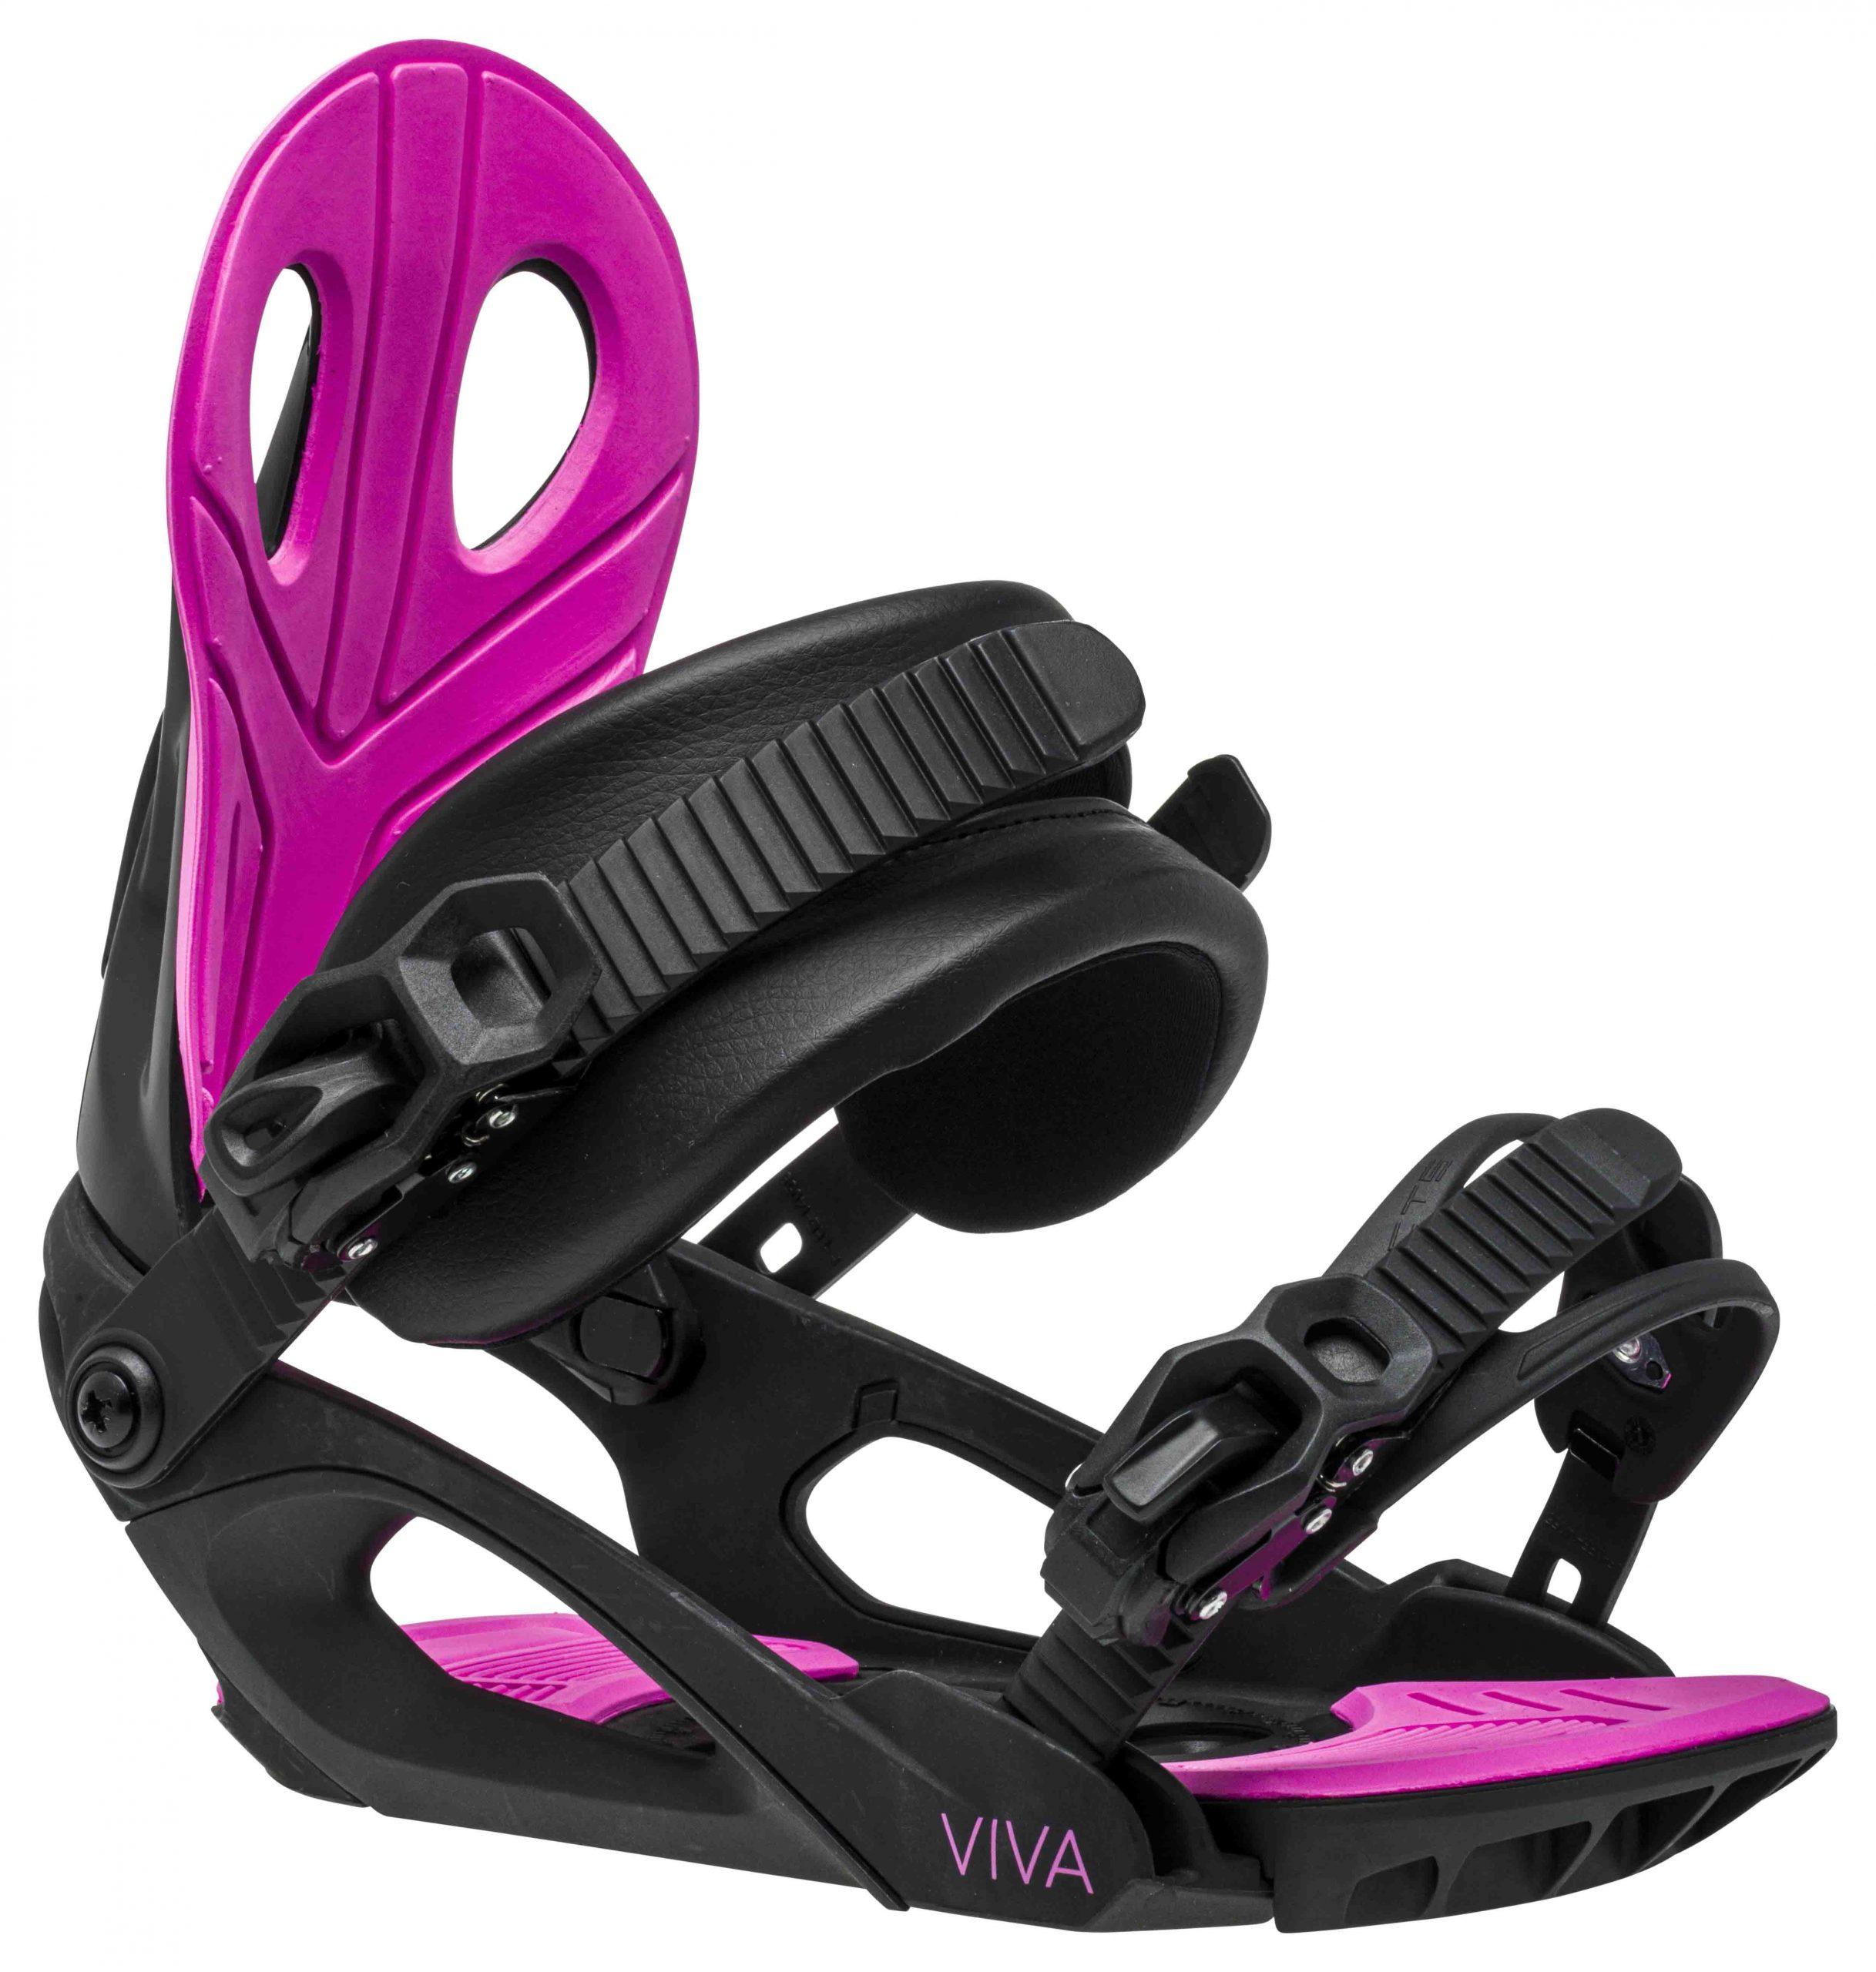 Roxy 21/22 Snowboard Bindings